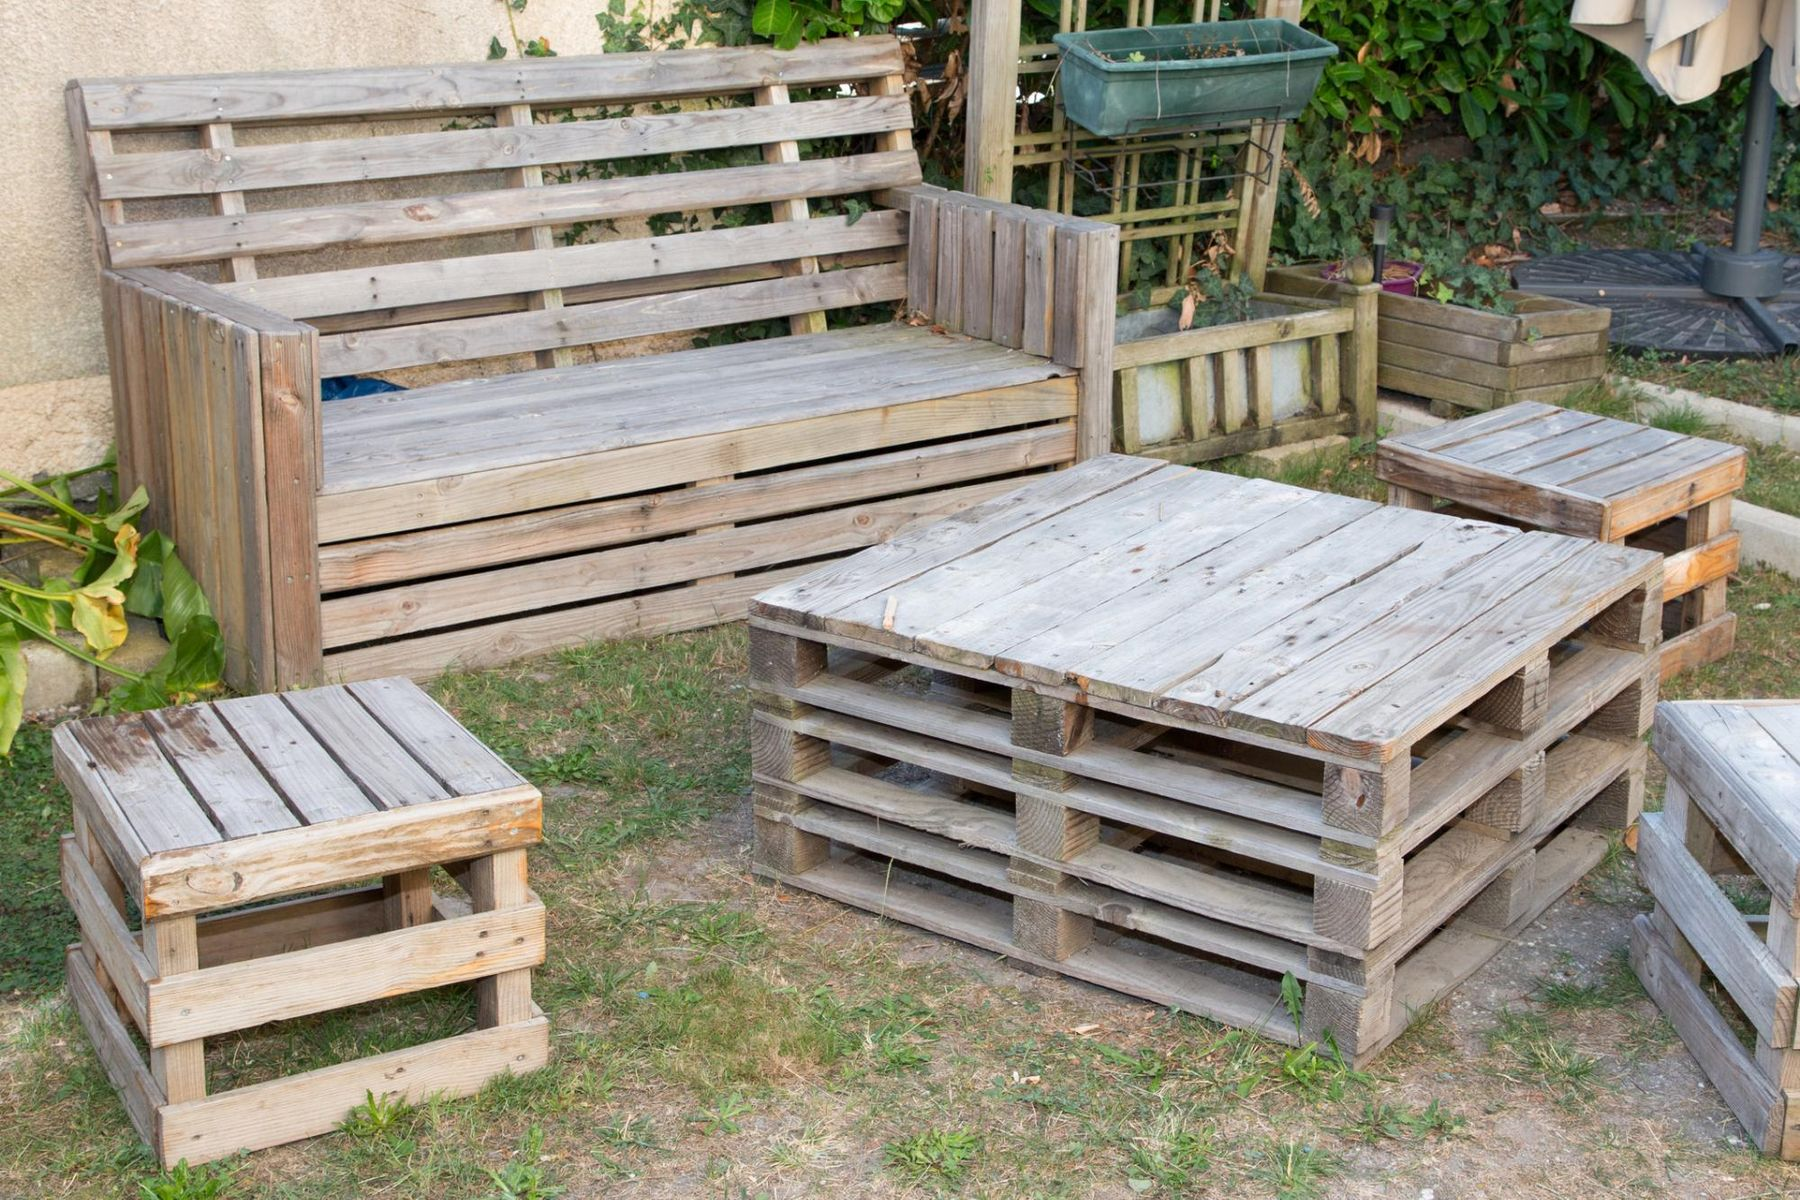 Step 6: Wood